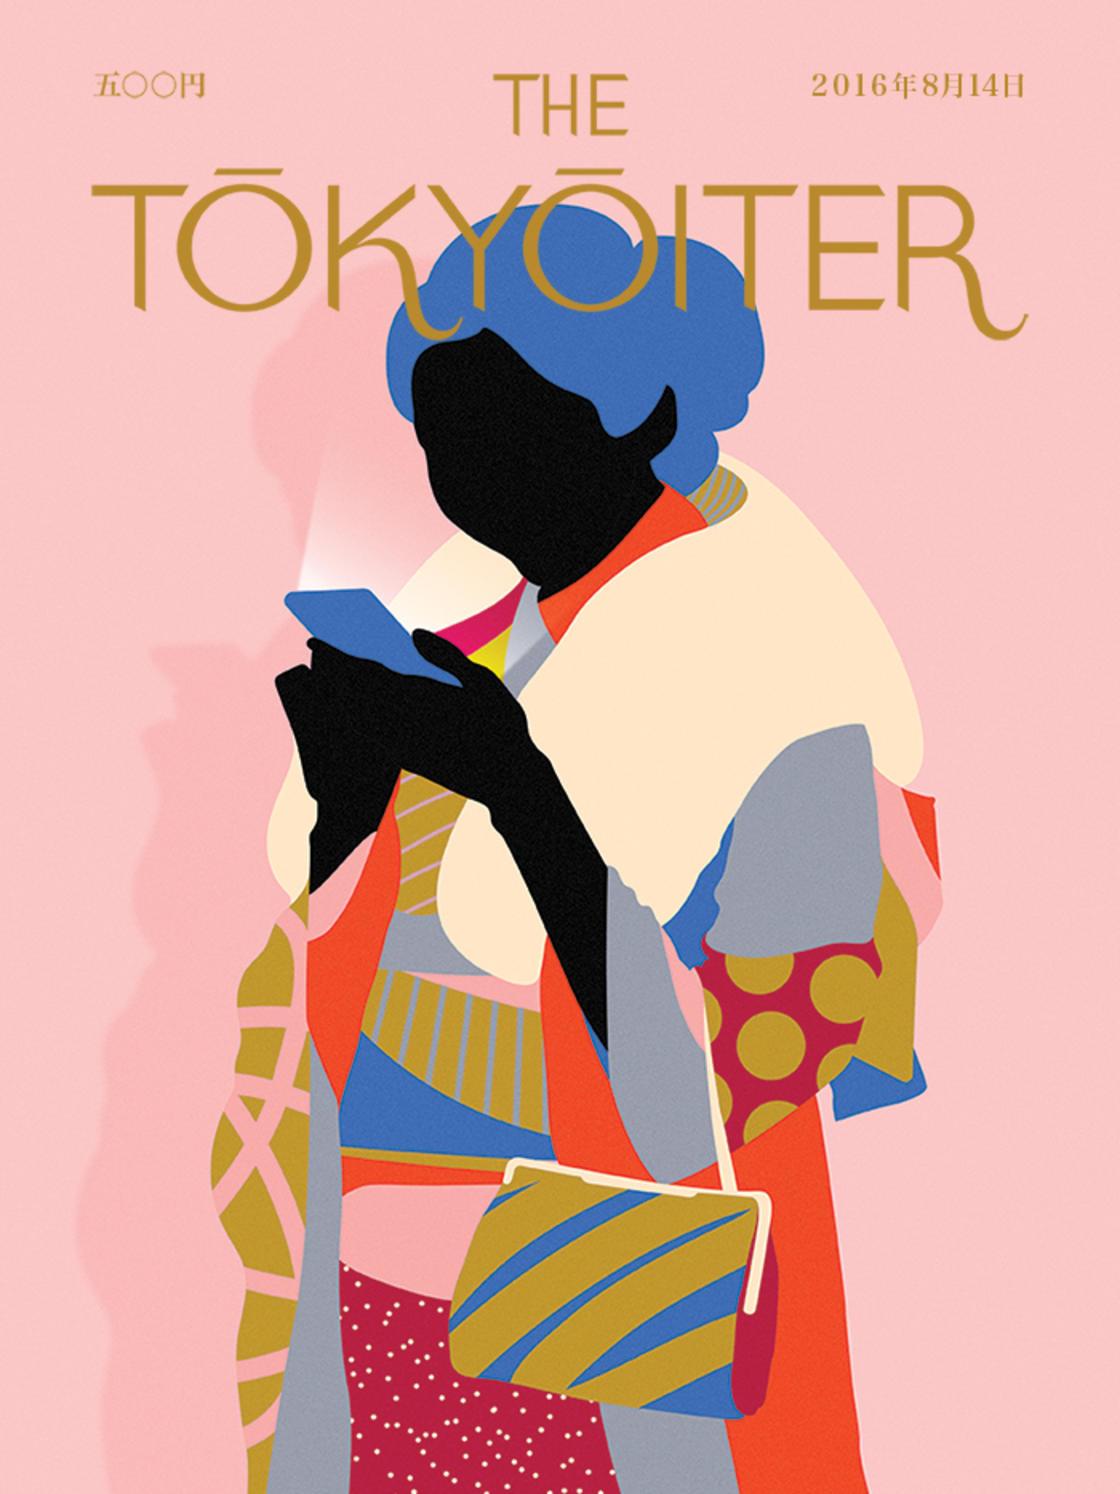 The Tokyoiter - Des illustrateurs rendent un bel hommage a Tokyo